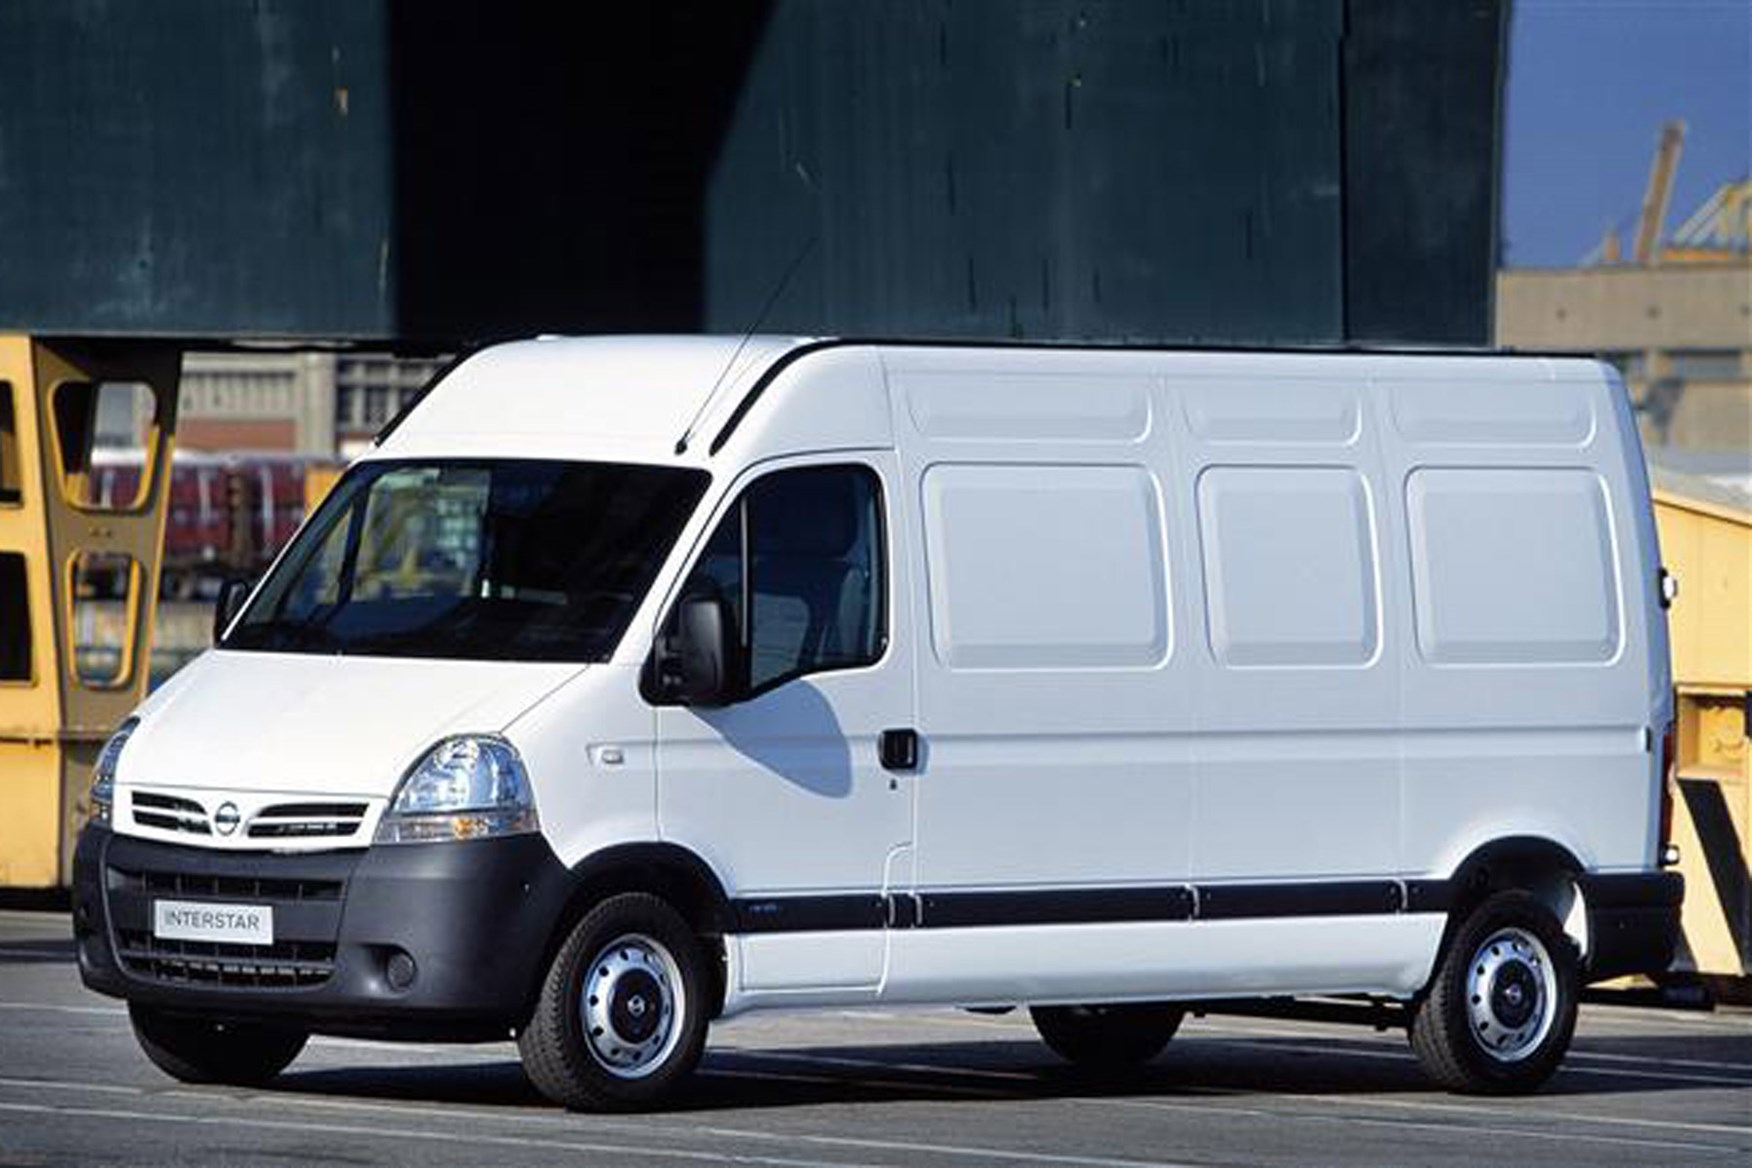 Nissan Interstar 2003-2011 review on Parkers Vans - exterior